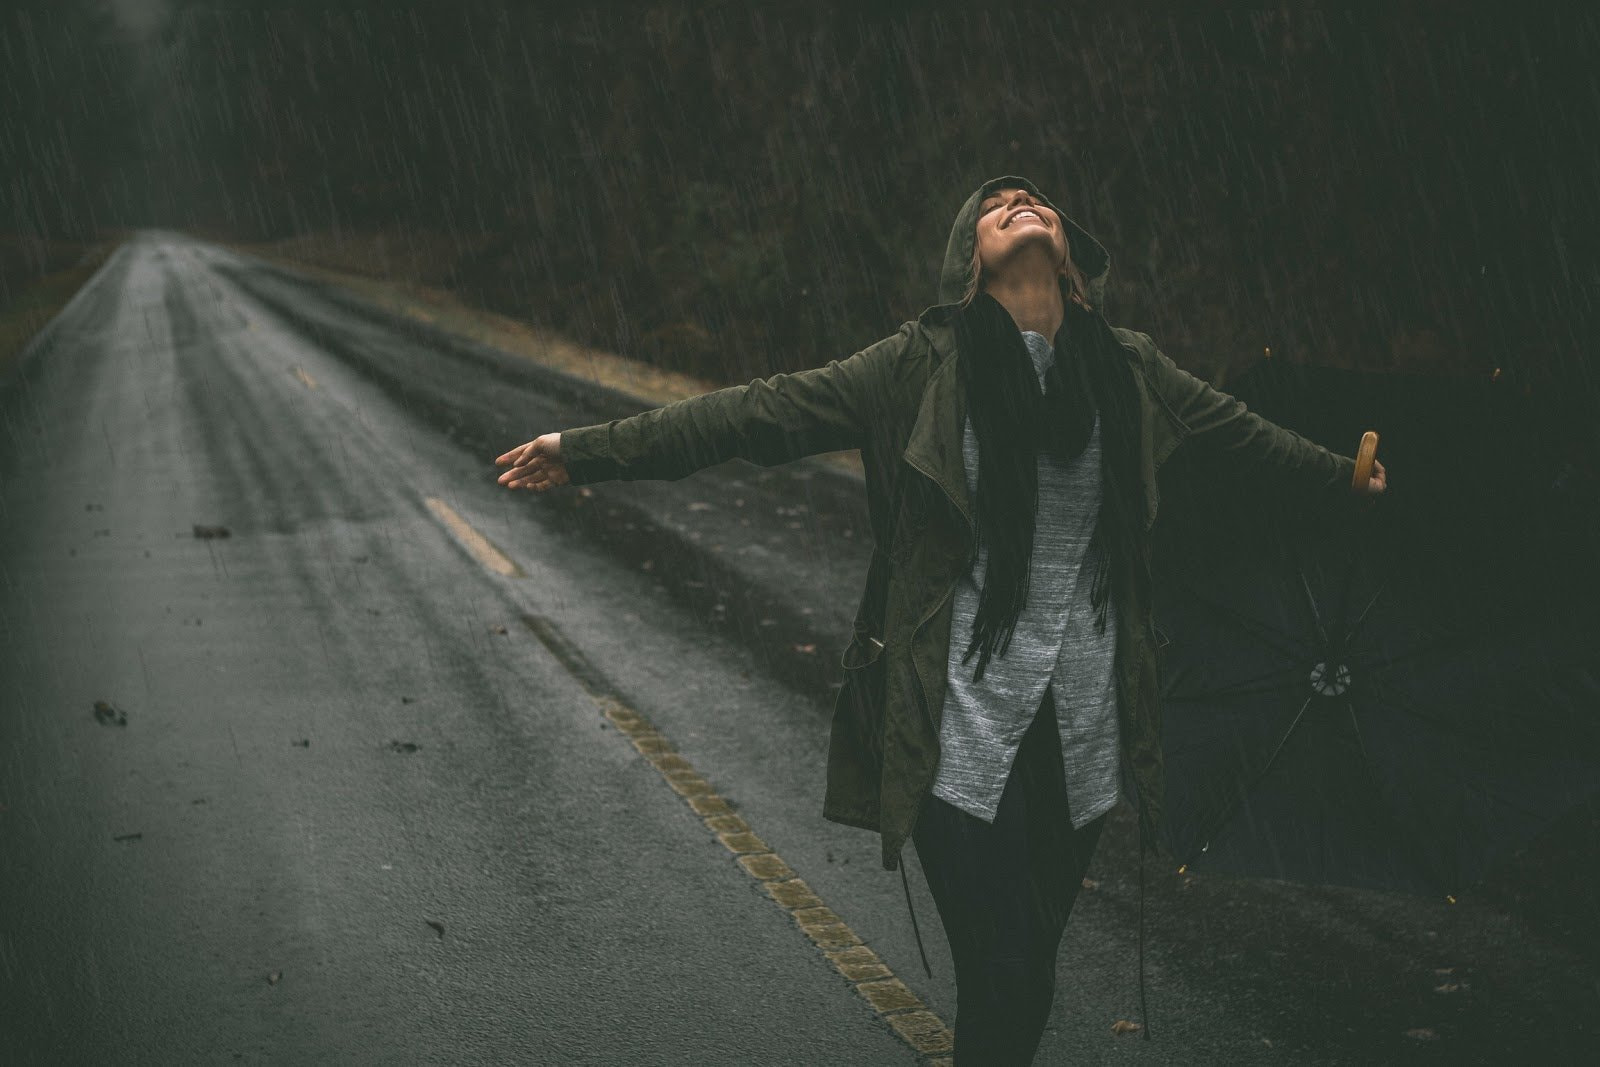 A woman wearing a green coat enjoying the rain by Robb Leahy